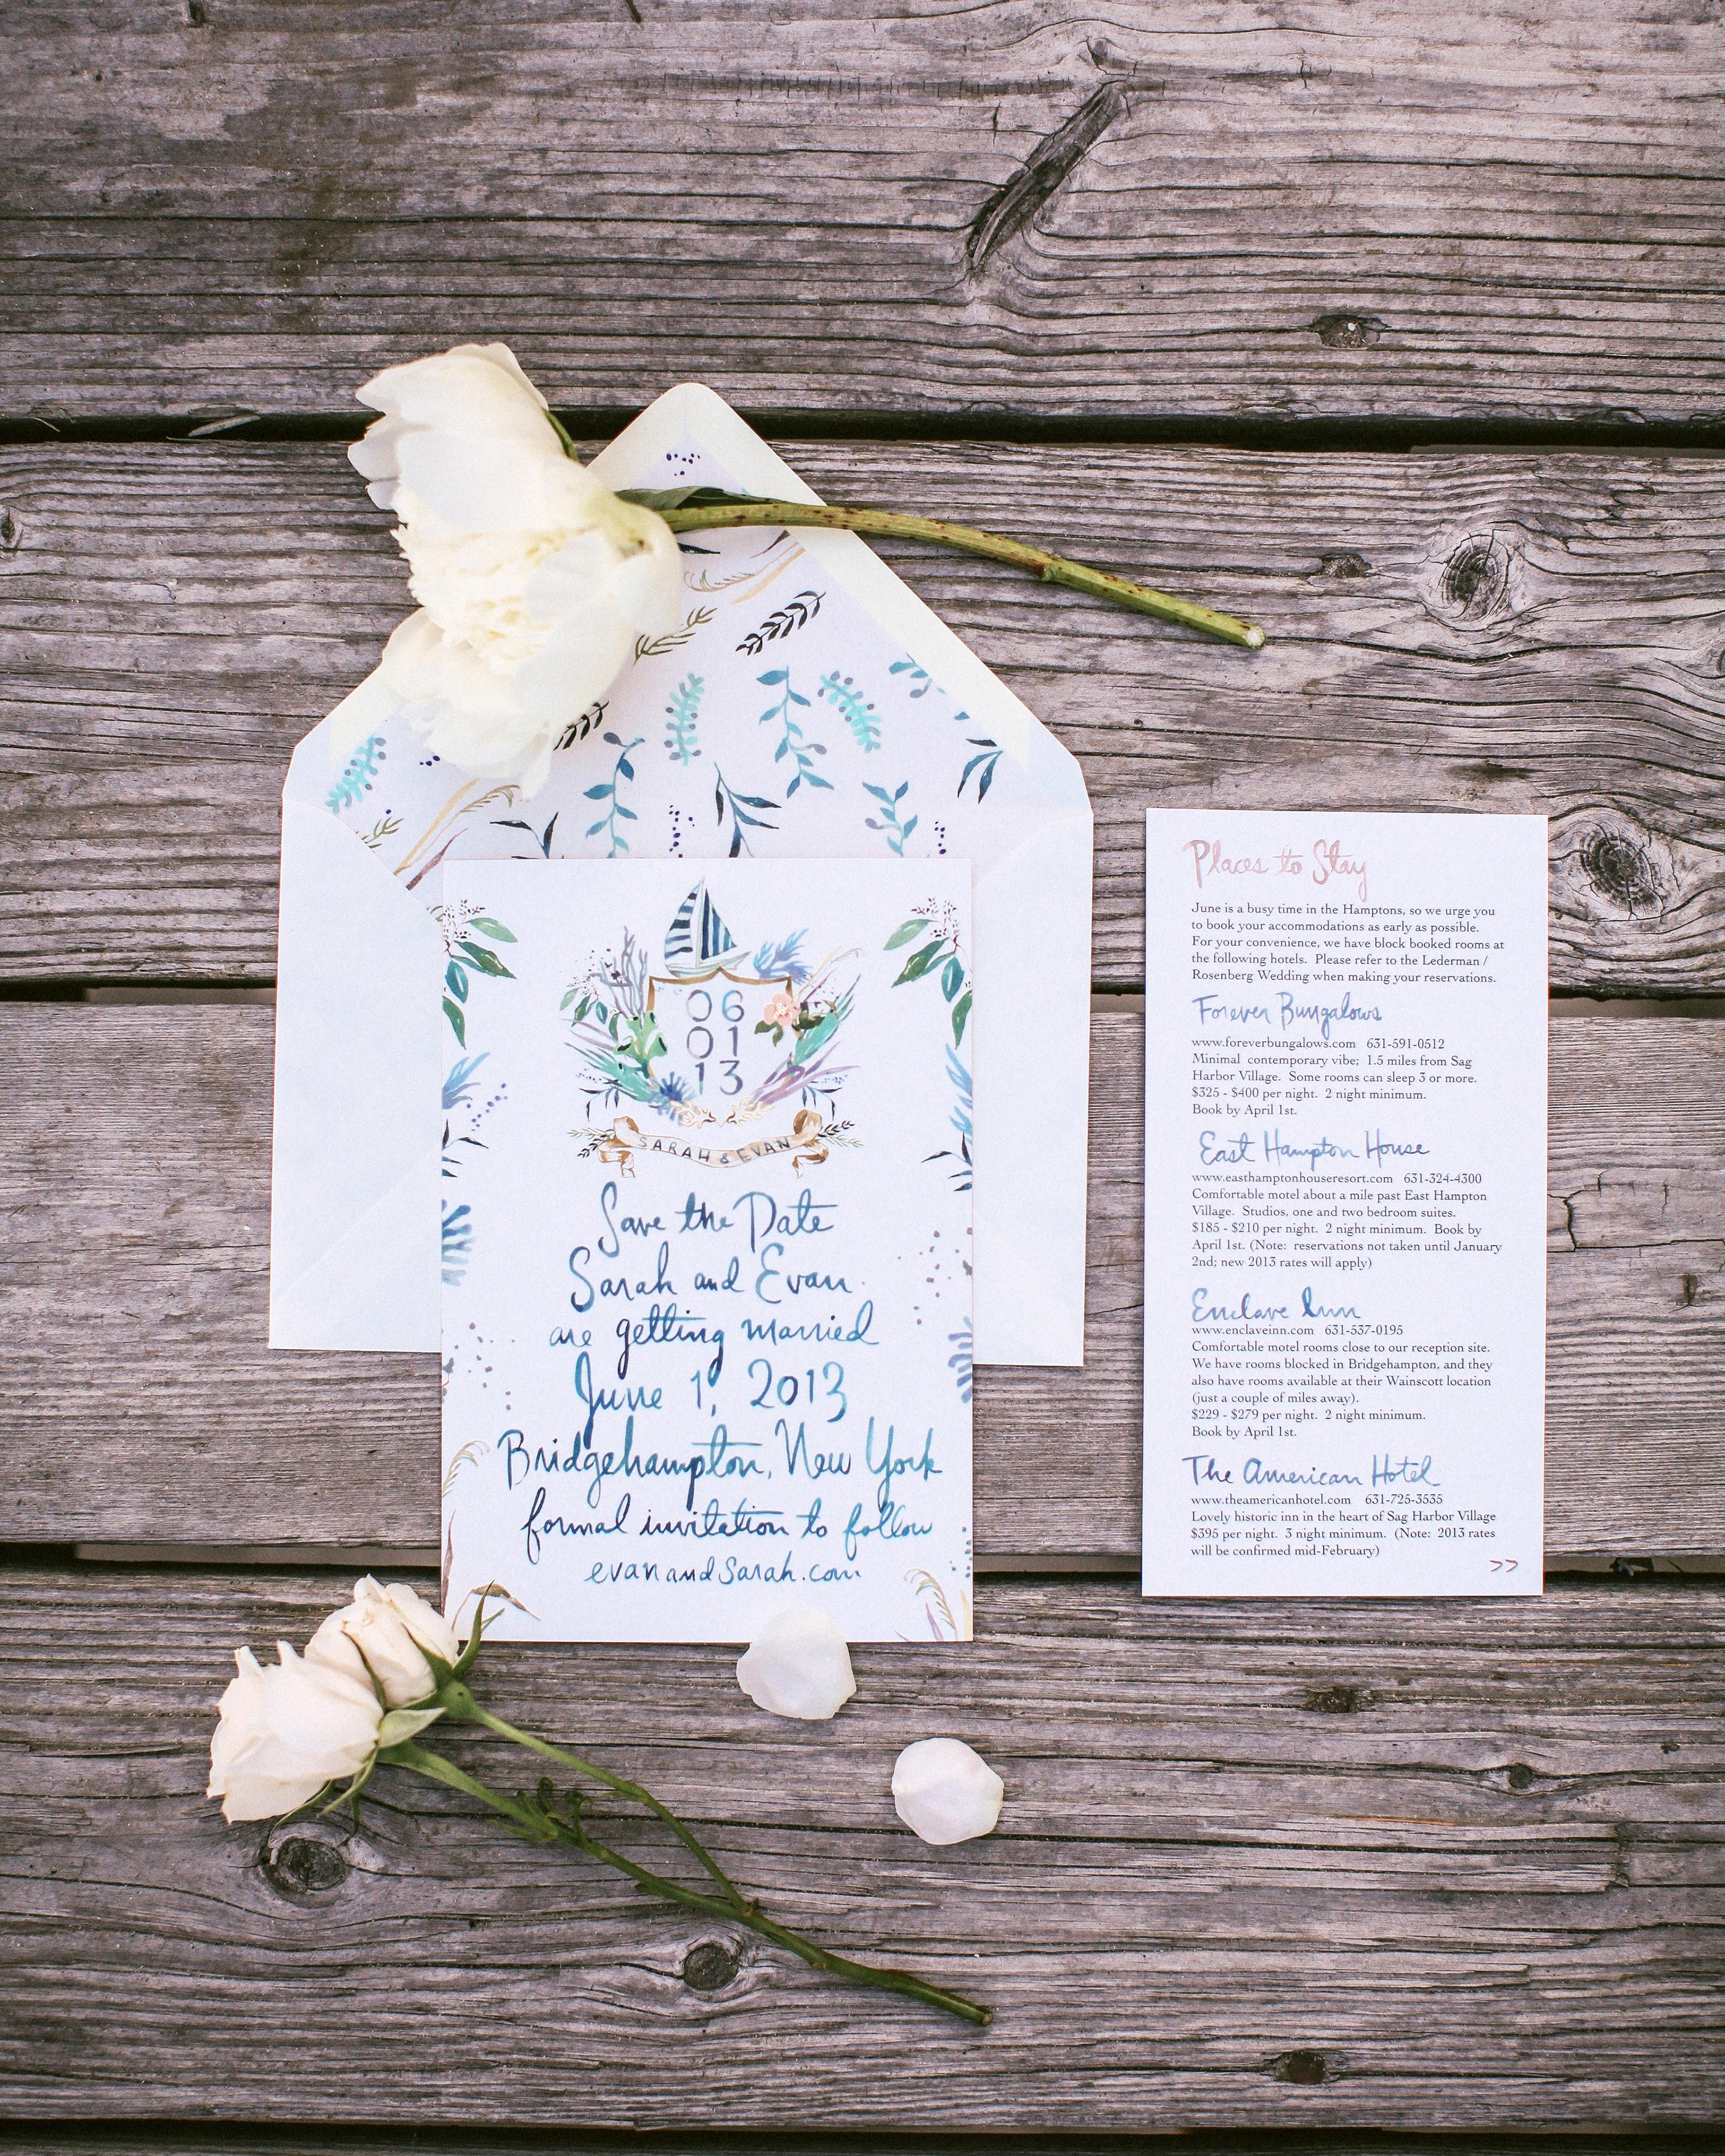 sarah-evan-wedding-invite-0514.jpg